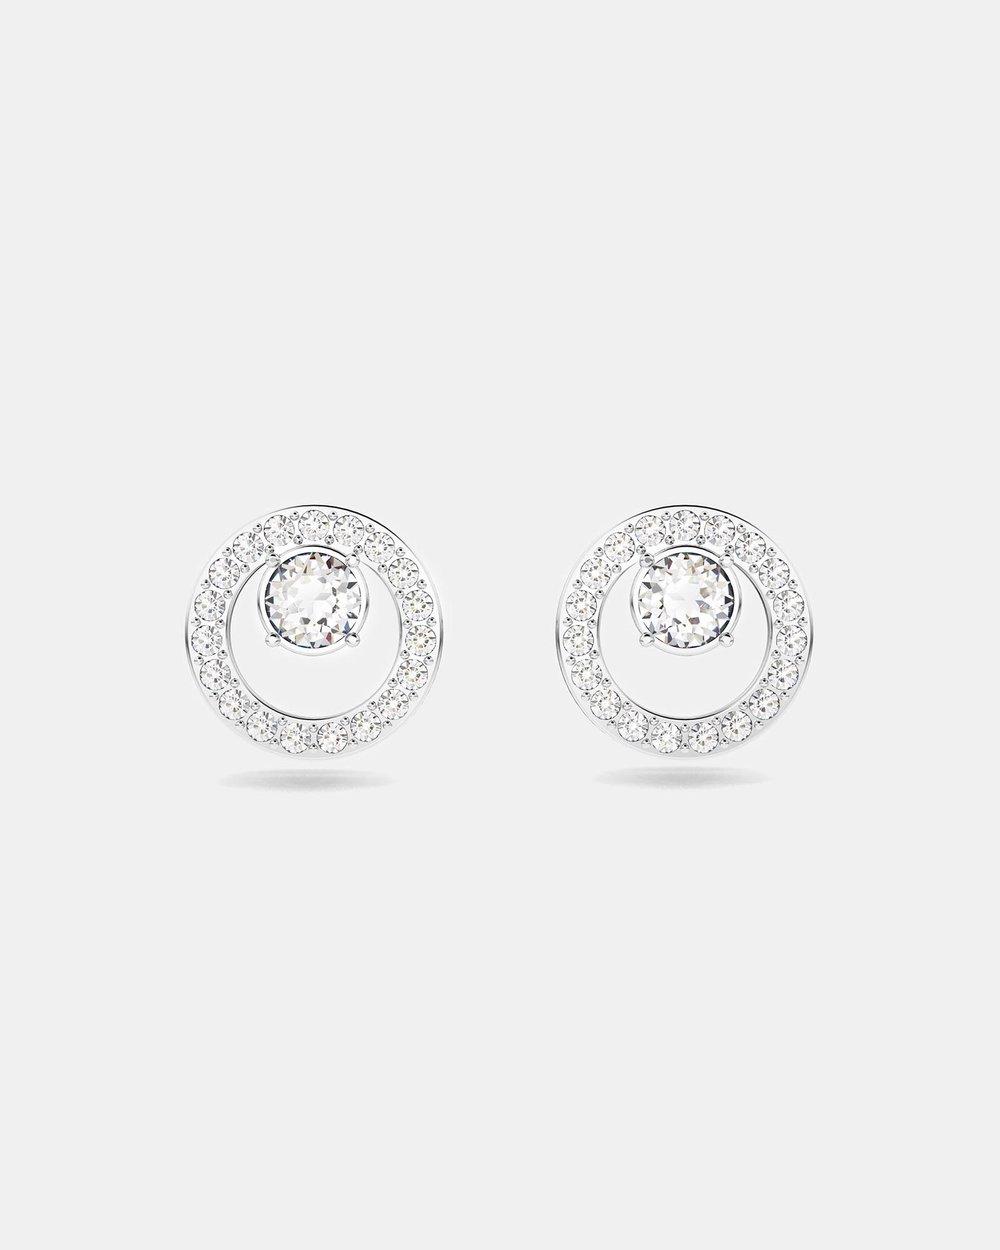 Creativity Circle Pierced Small Earrings by Swarovski Online  0b326e96c70